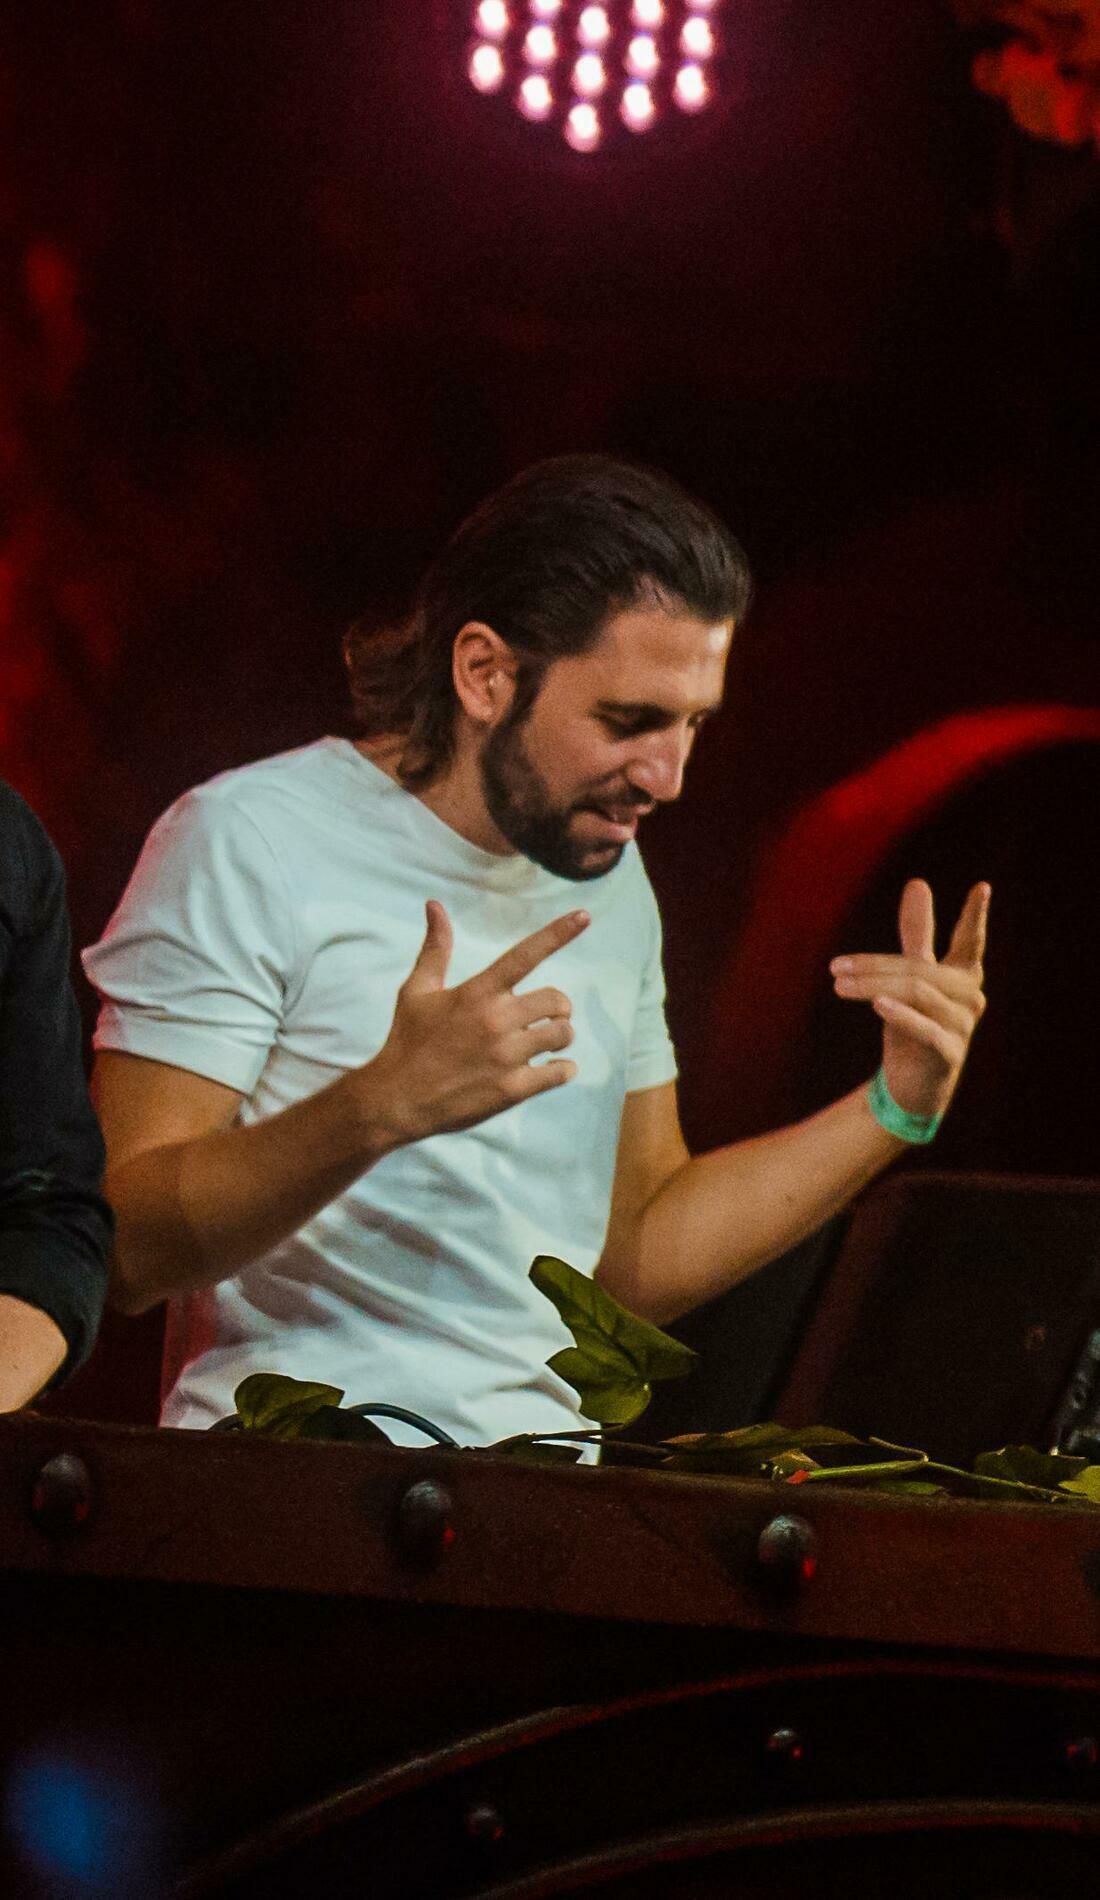 A Dimitri Vegas & Like Mike live event